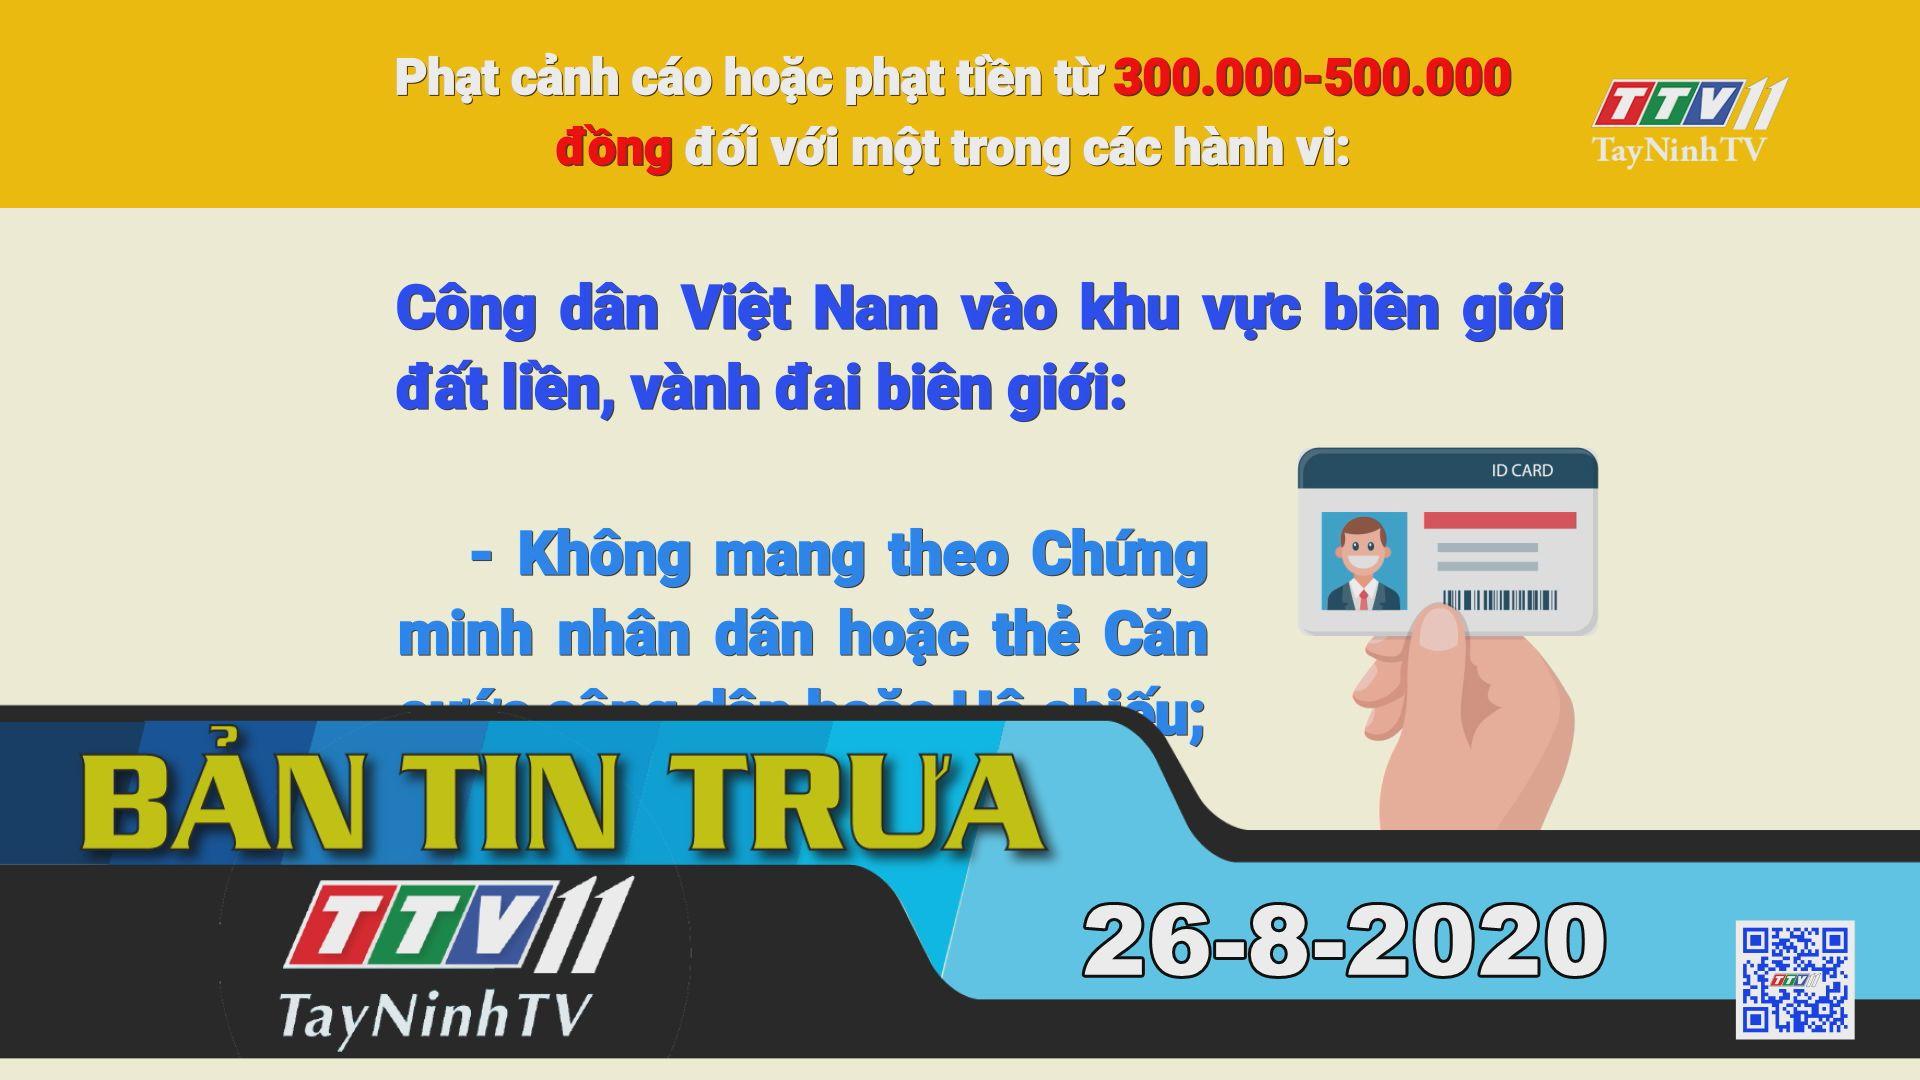 Bản tin trưa 26-8-2020 | Tin tức hôm nay | TayNinhTV